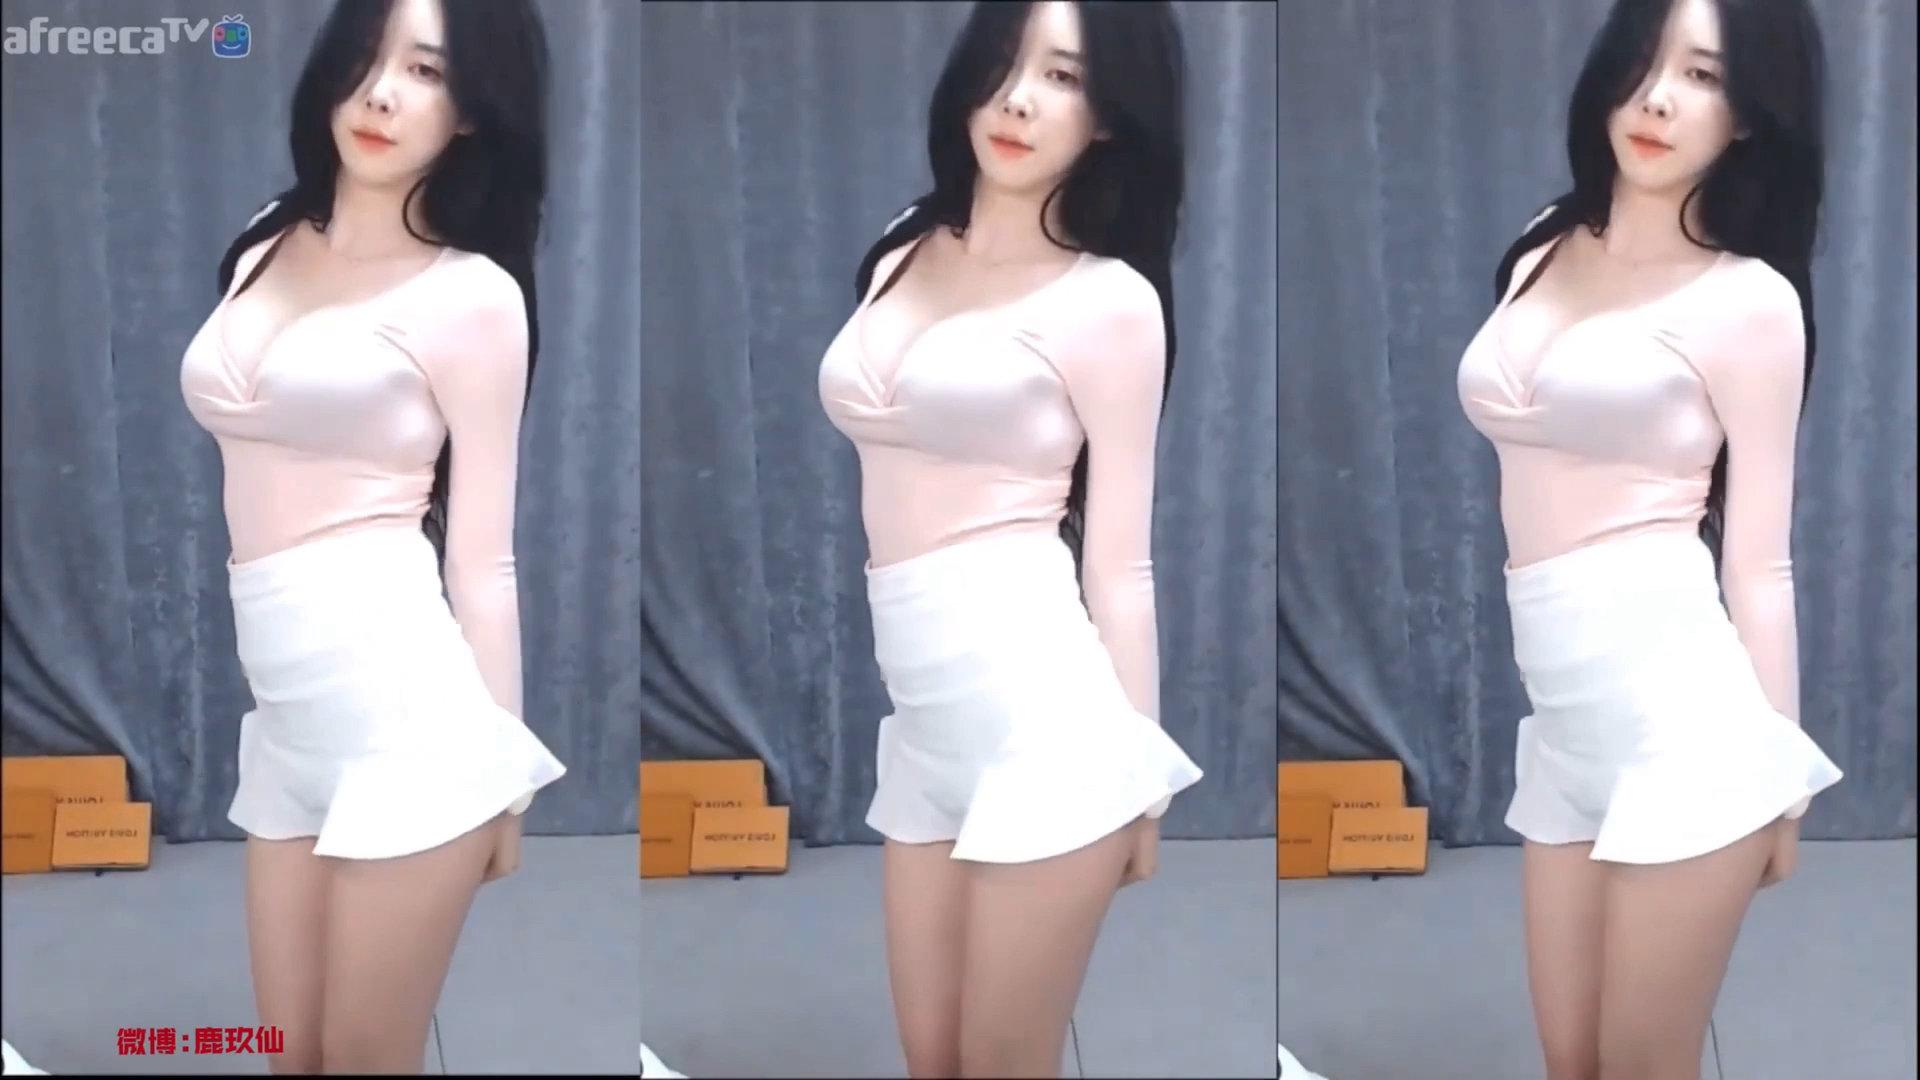 【AfreecaTV-赛拉】20200121韩国主播性感热舞 1录制视频